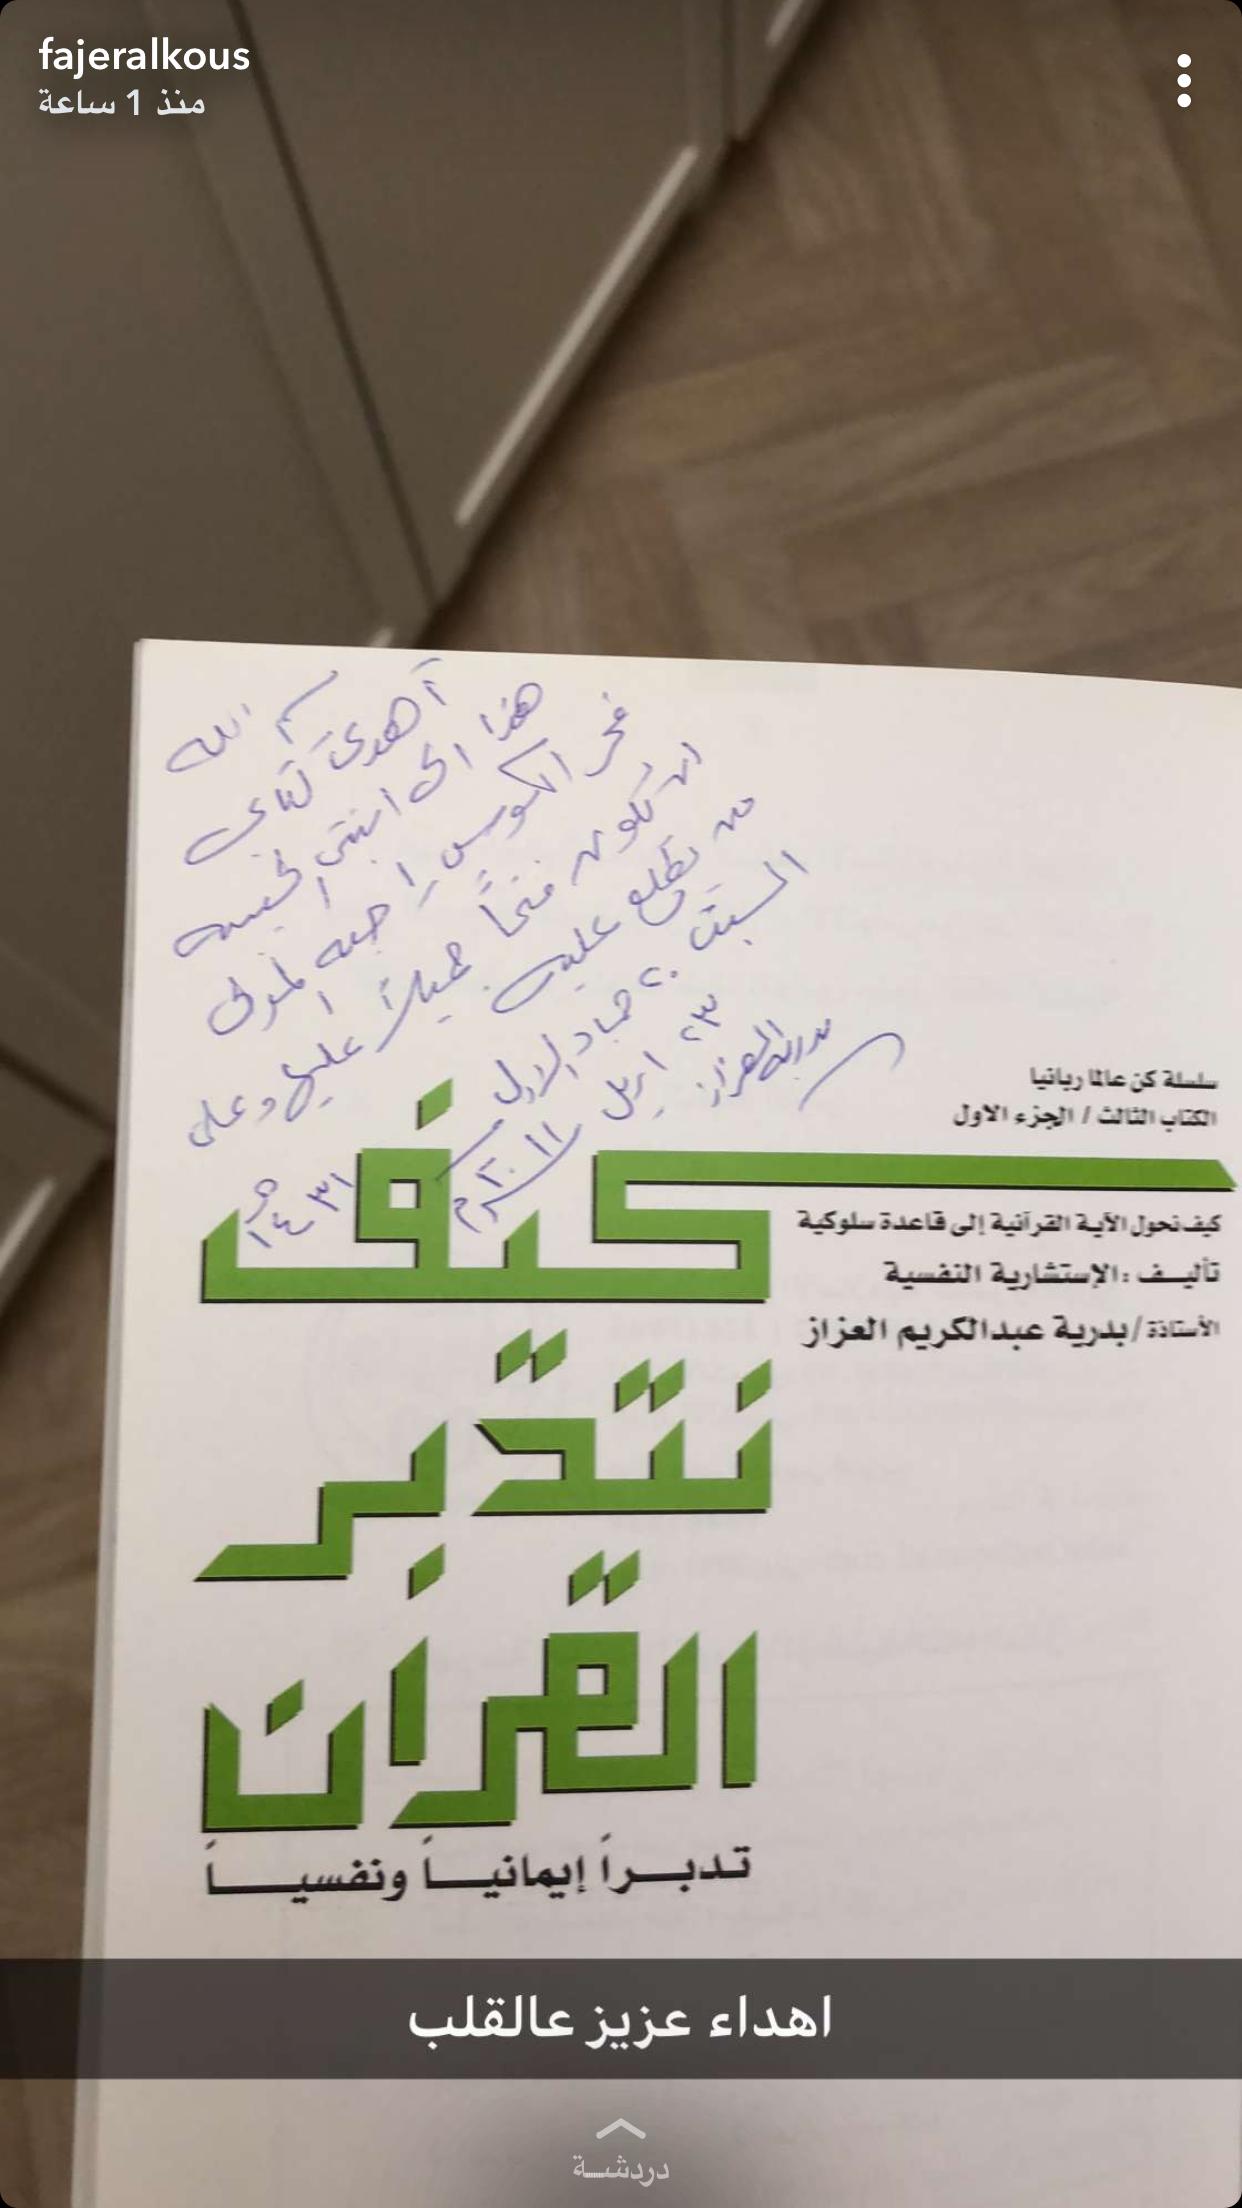 Pin By شهد سلامة On كتب Inspirational Books Arabic Books Ebooks Free Books